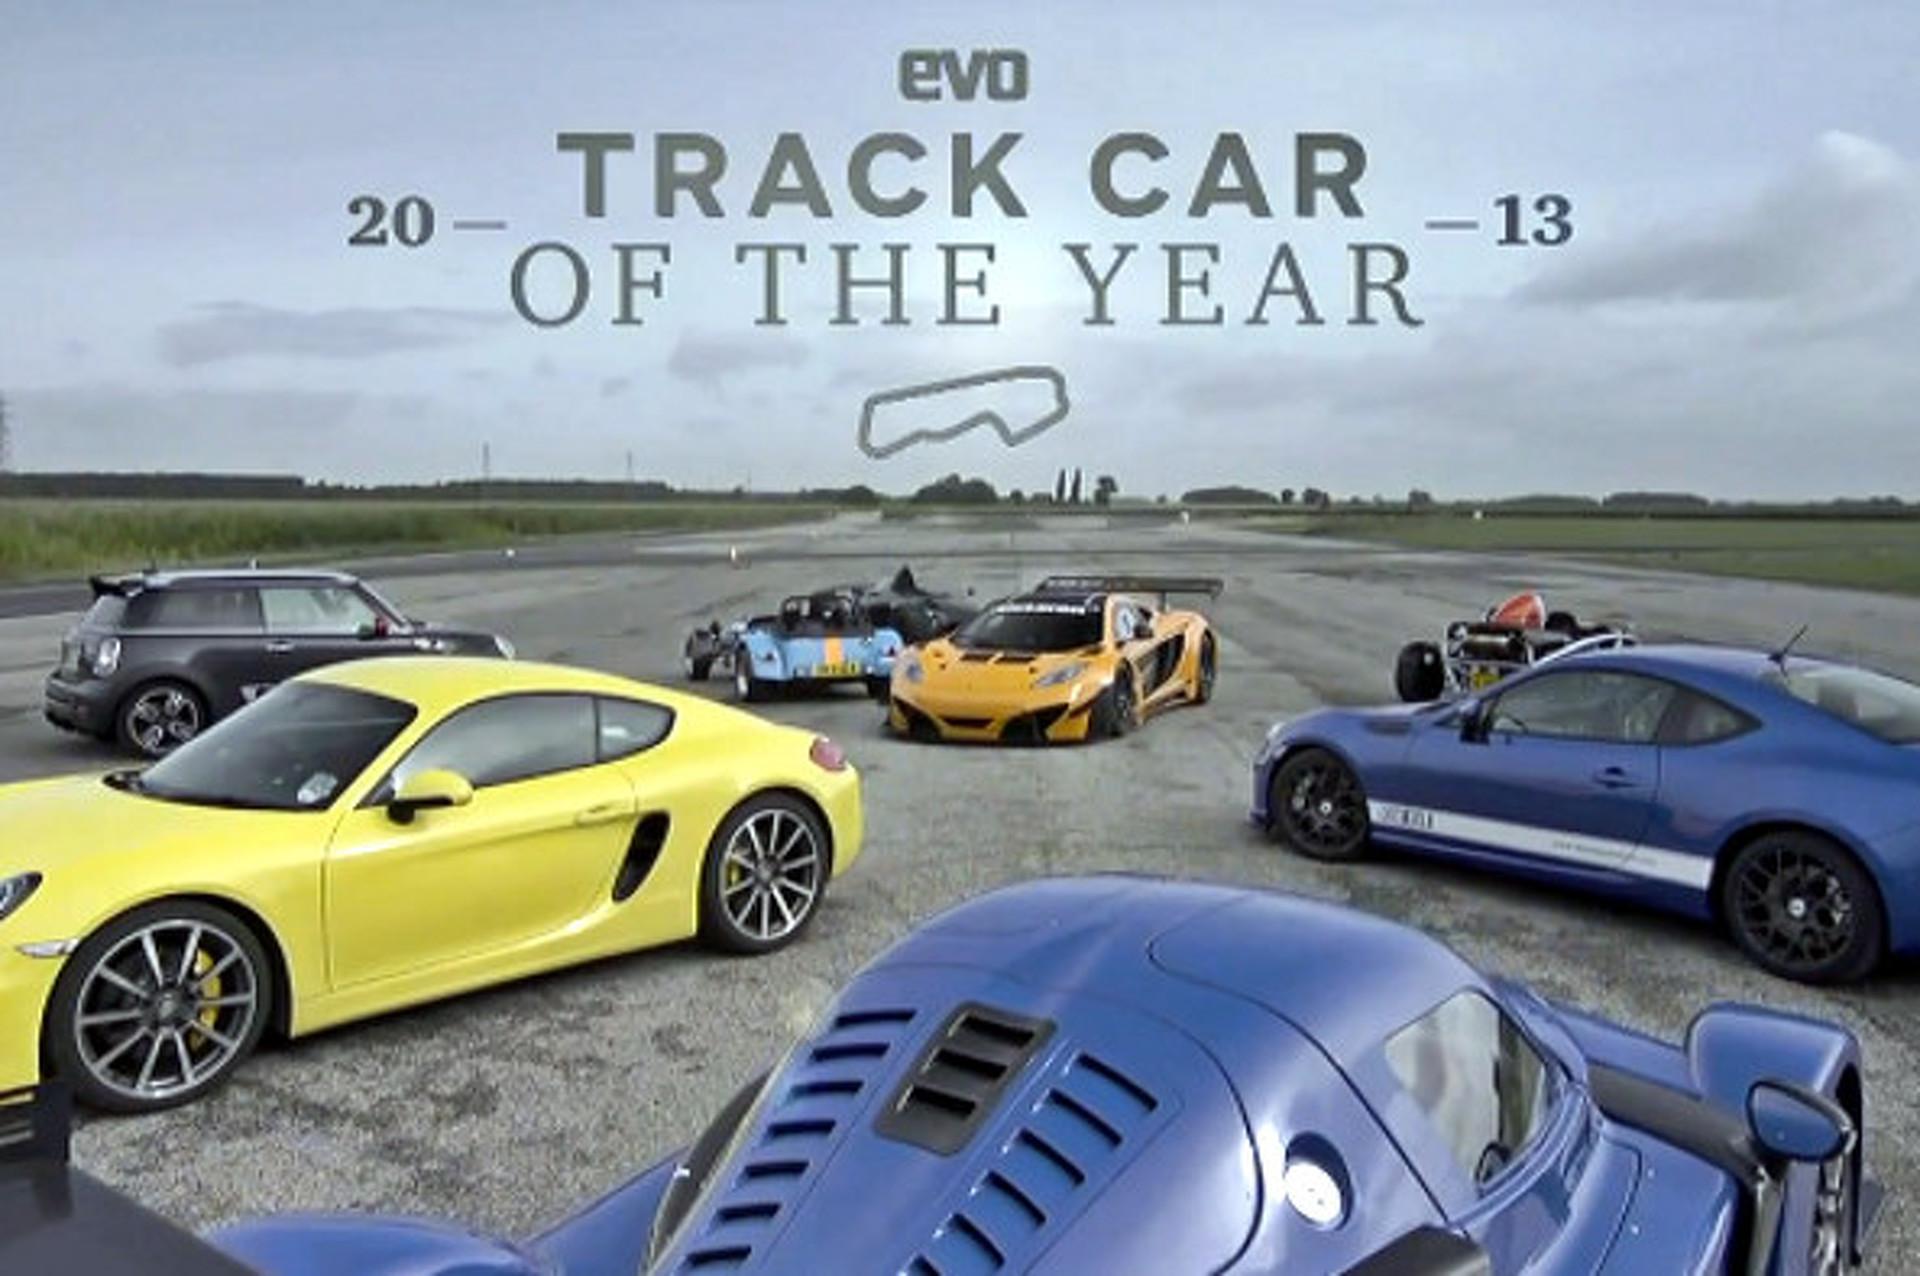 EVO Magazine Names 2013 Track Car of the Year [video]